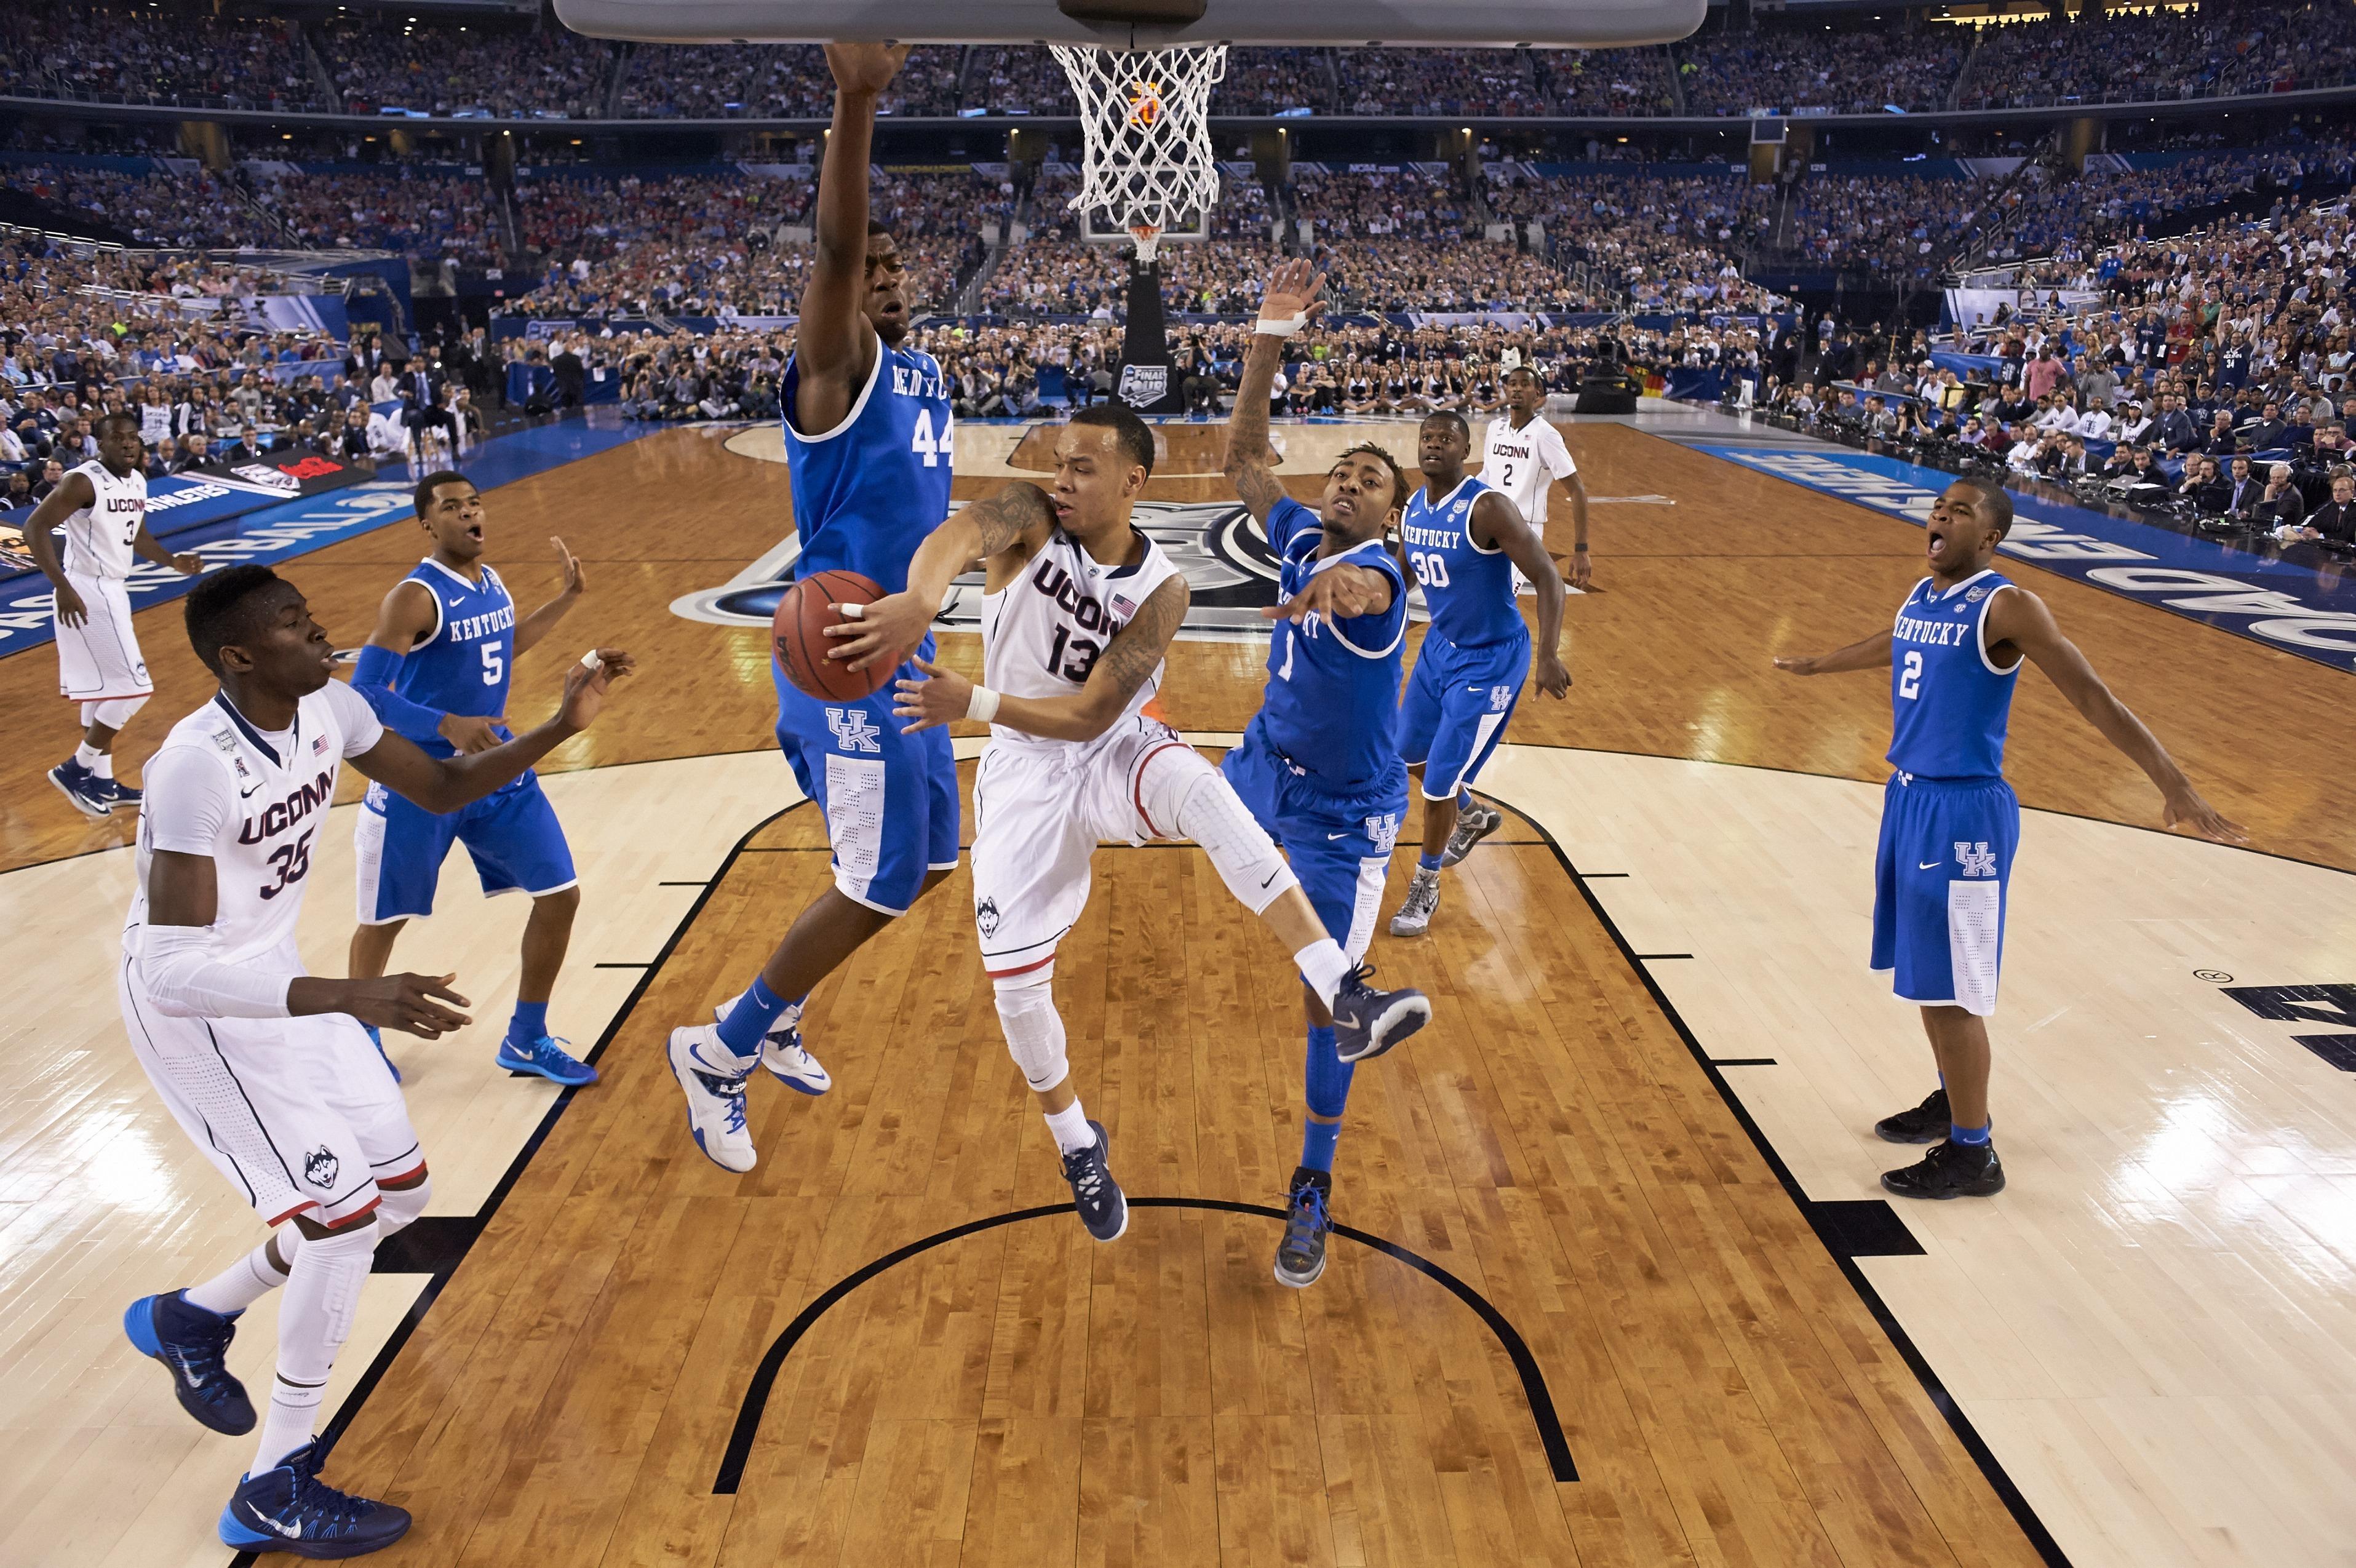 University of Connecticut vs University of Kentucky, 2014 NCAA National Championship